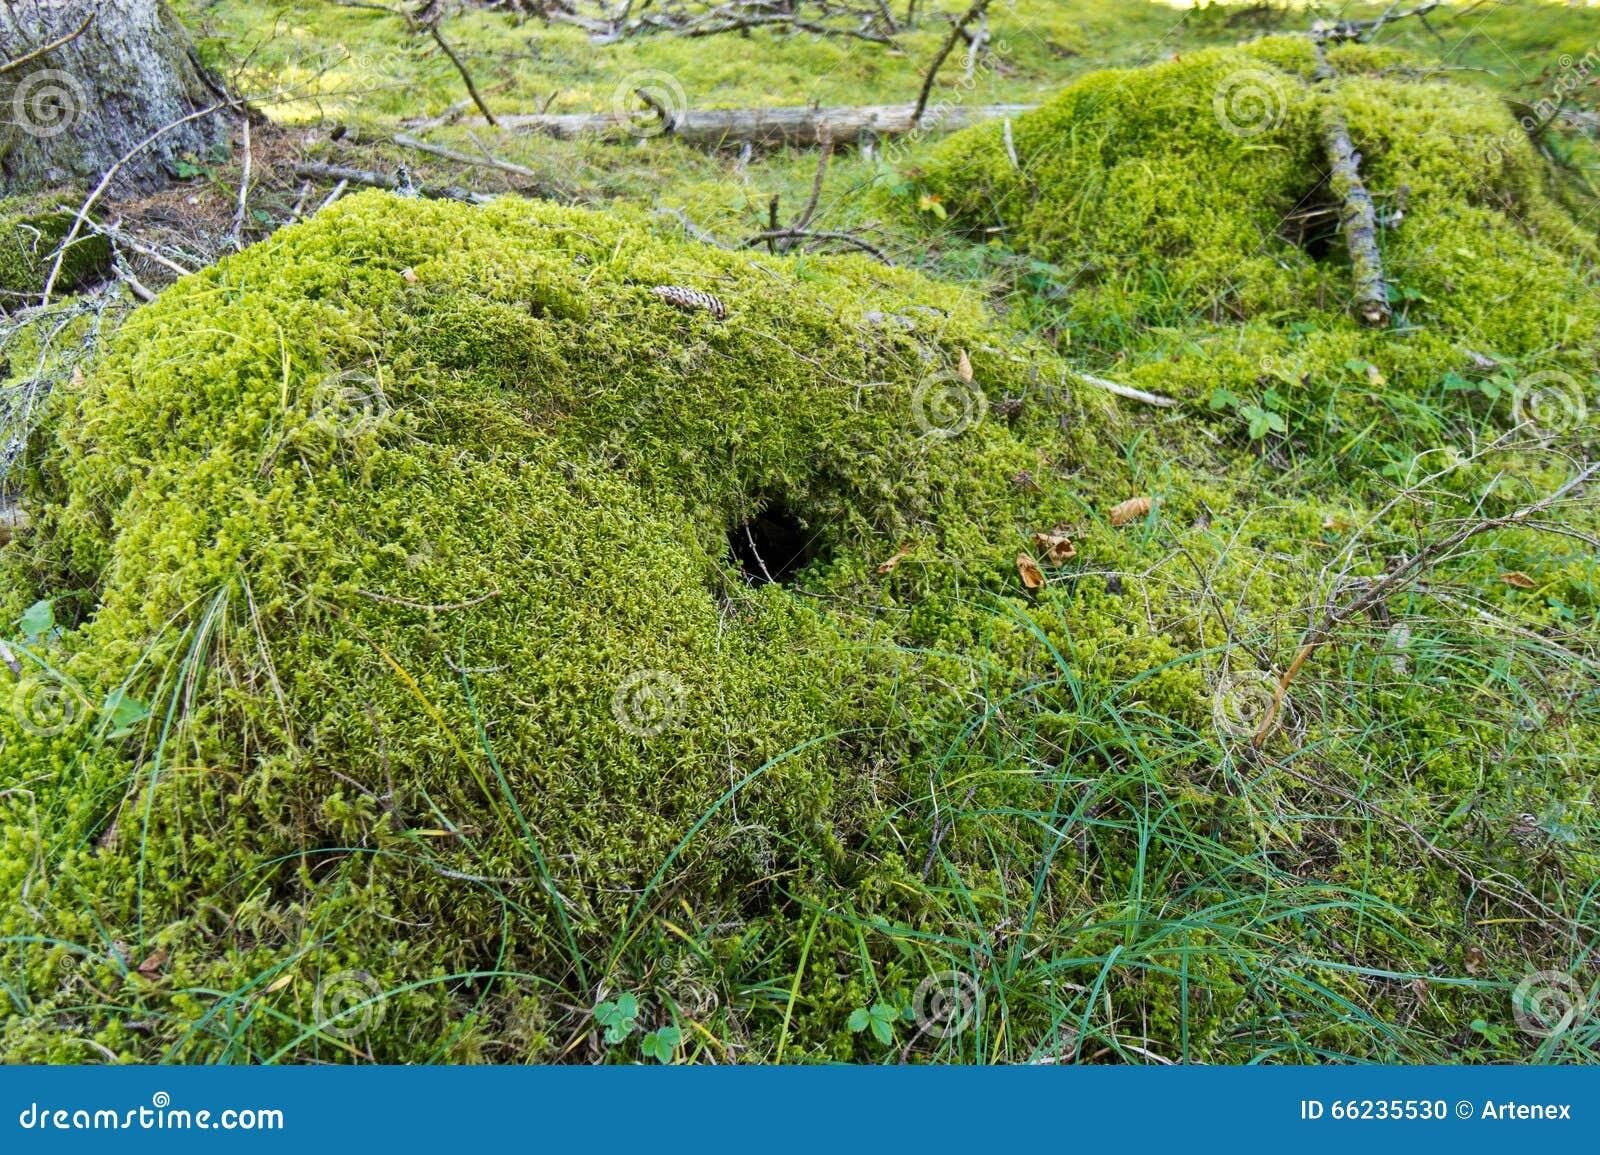 Moss sod